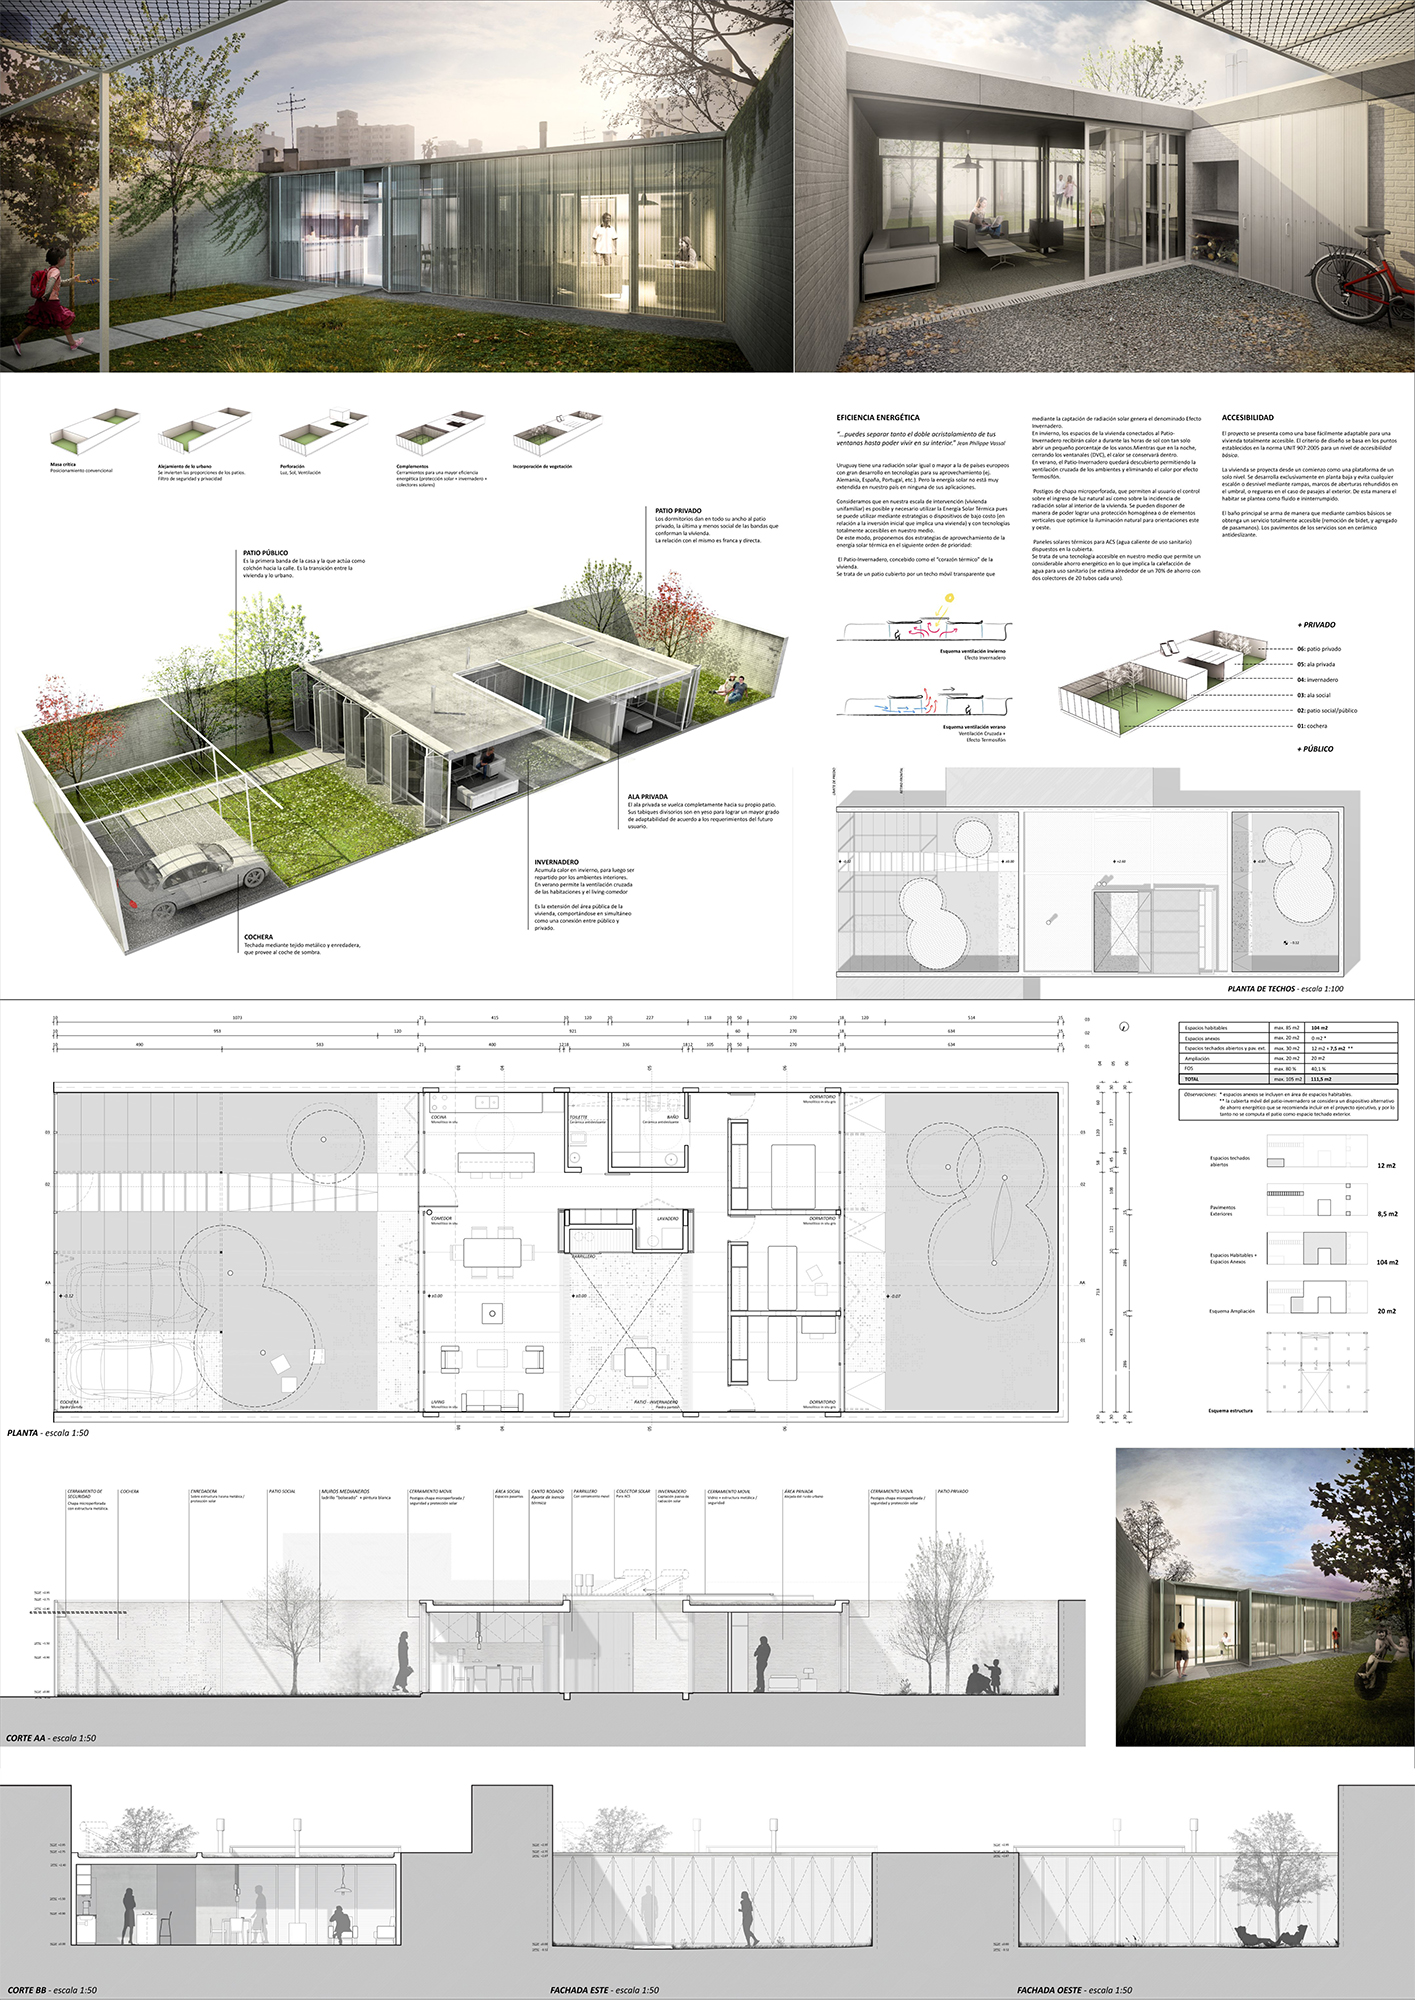 Casa 2009 casa de arquitectura rifa for Casa de los azulejos arquitectura